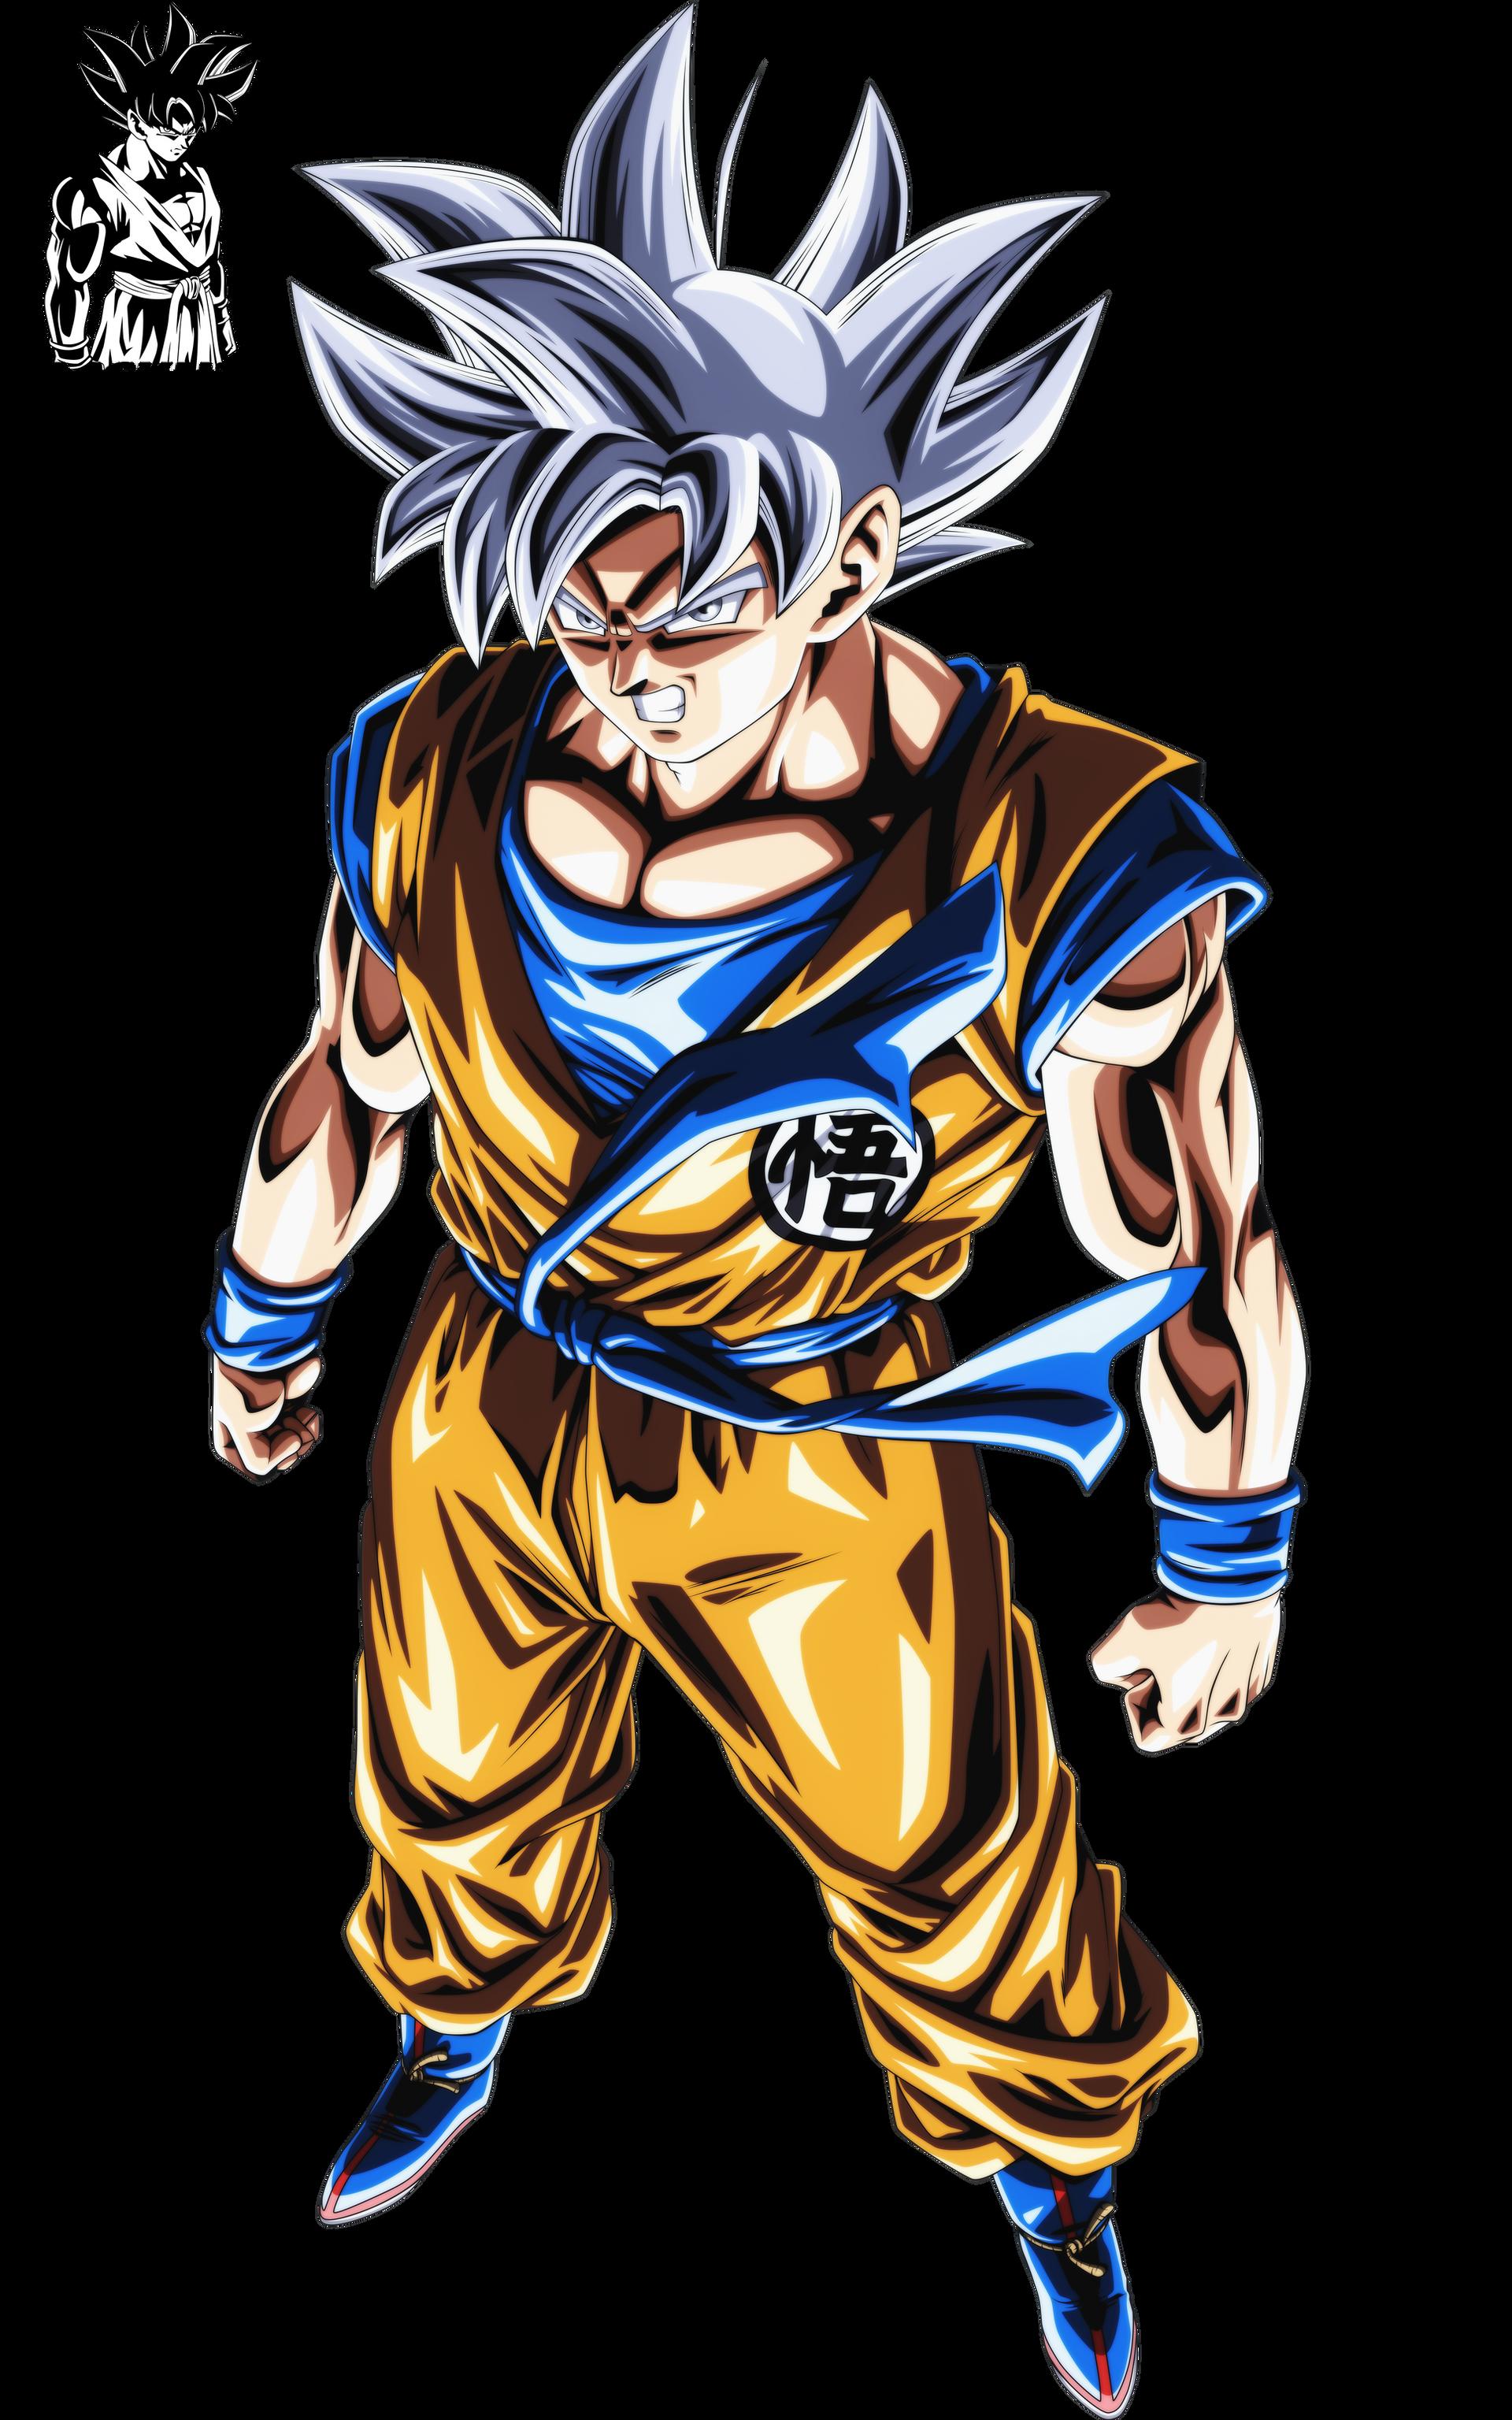 Dragon Ball Render by ajckh2 on DeviantArt